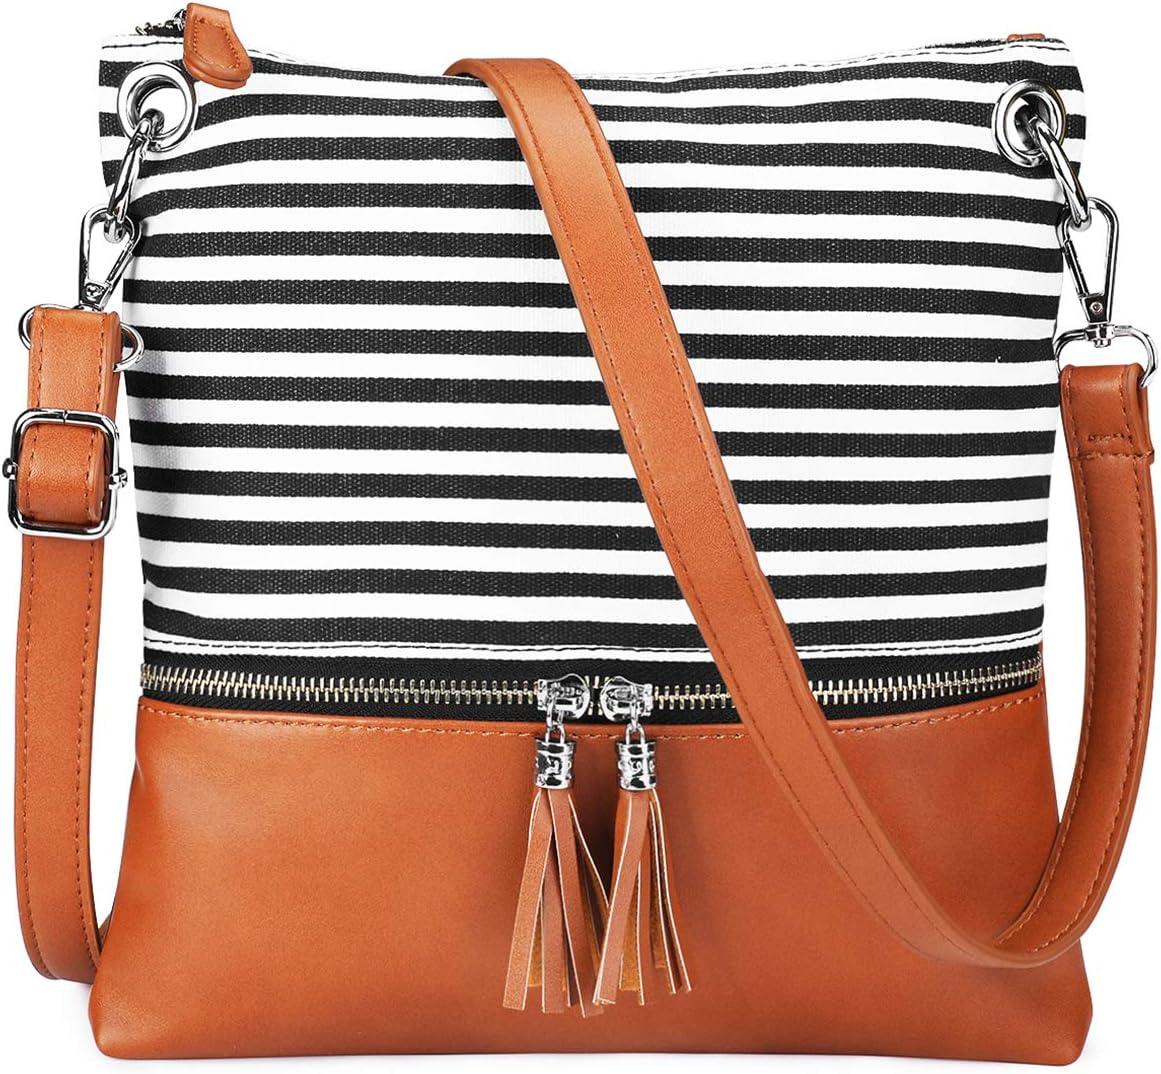 Newshows Women Lightweight Medium Canvas PU Leather Crossbody Bag with Tassel B-Black